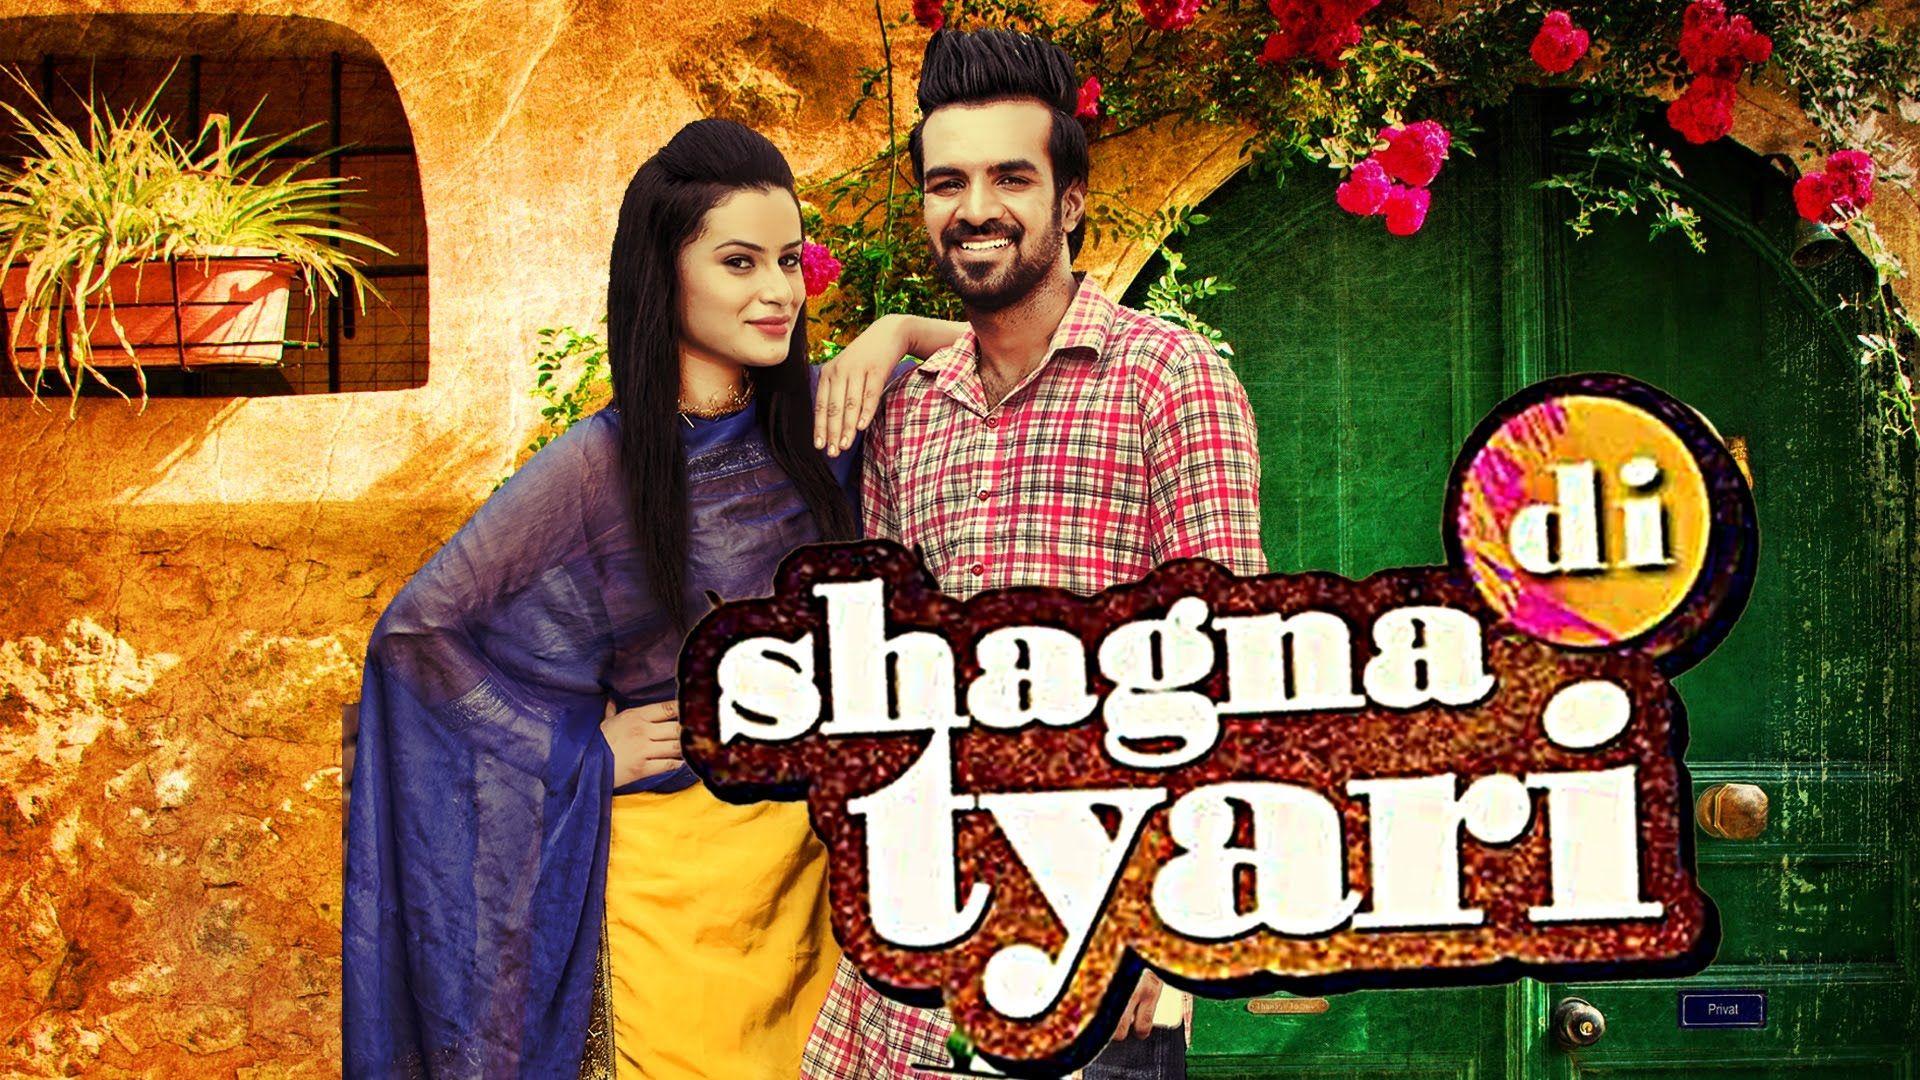 Silent love 2 punjabi video song download